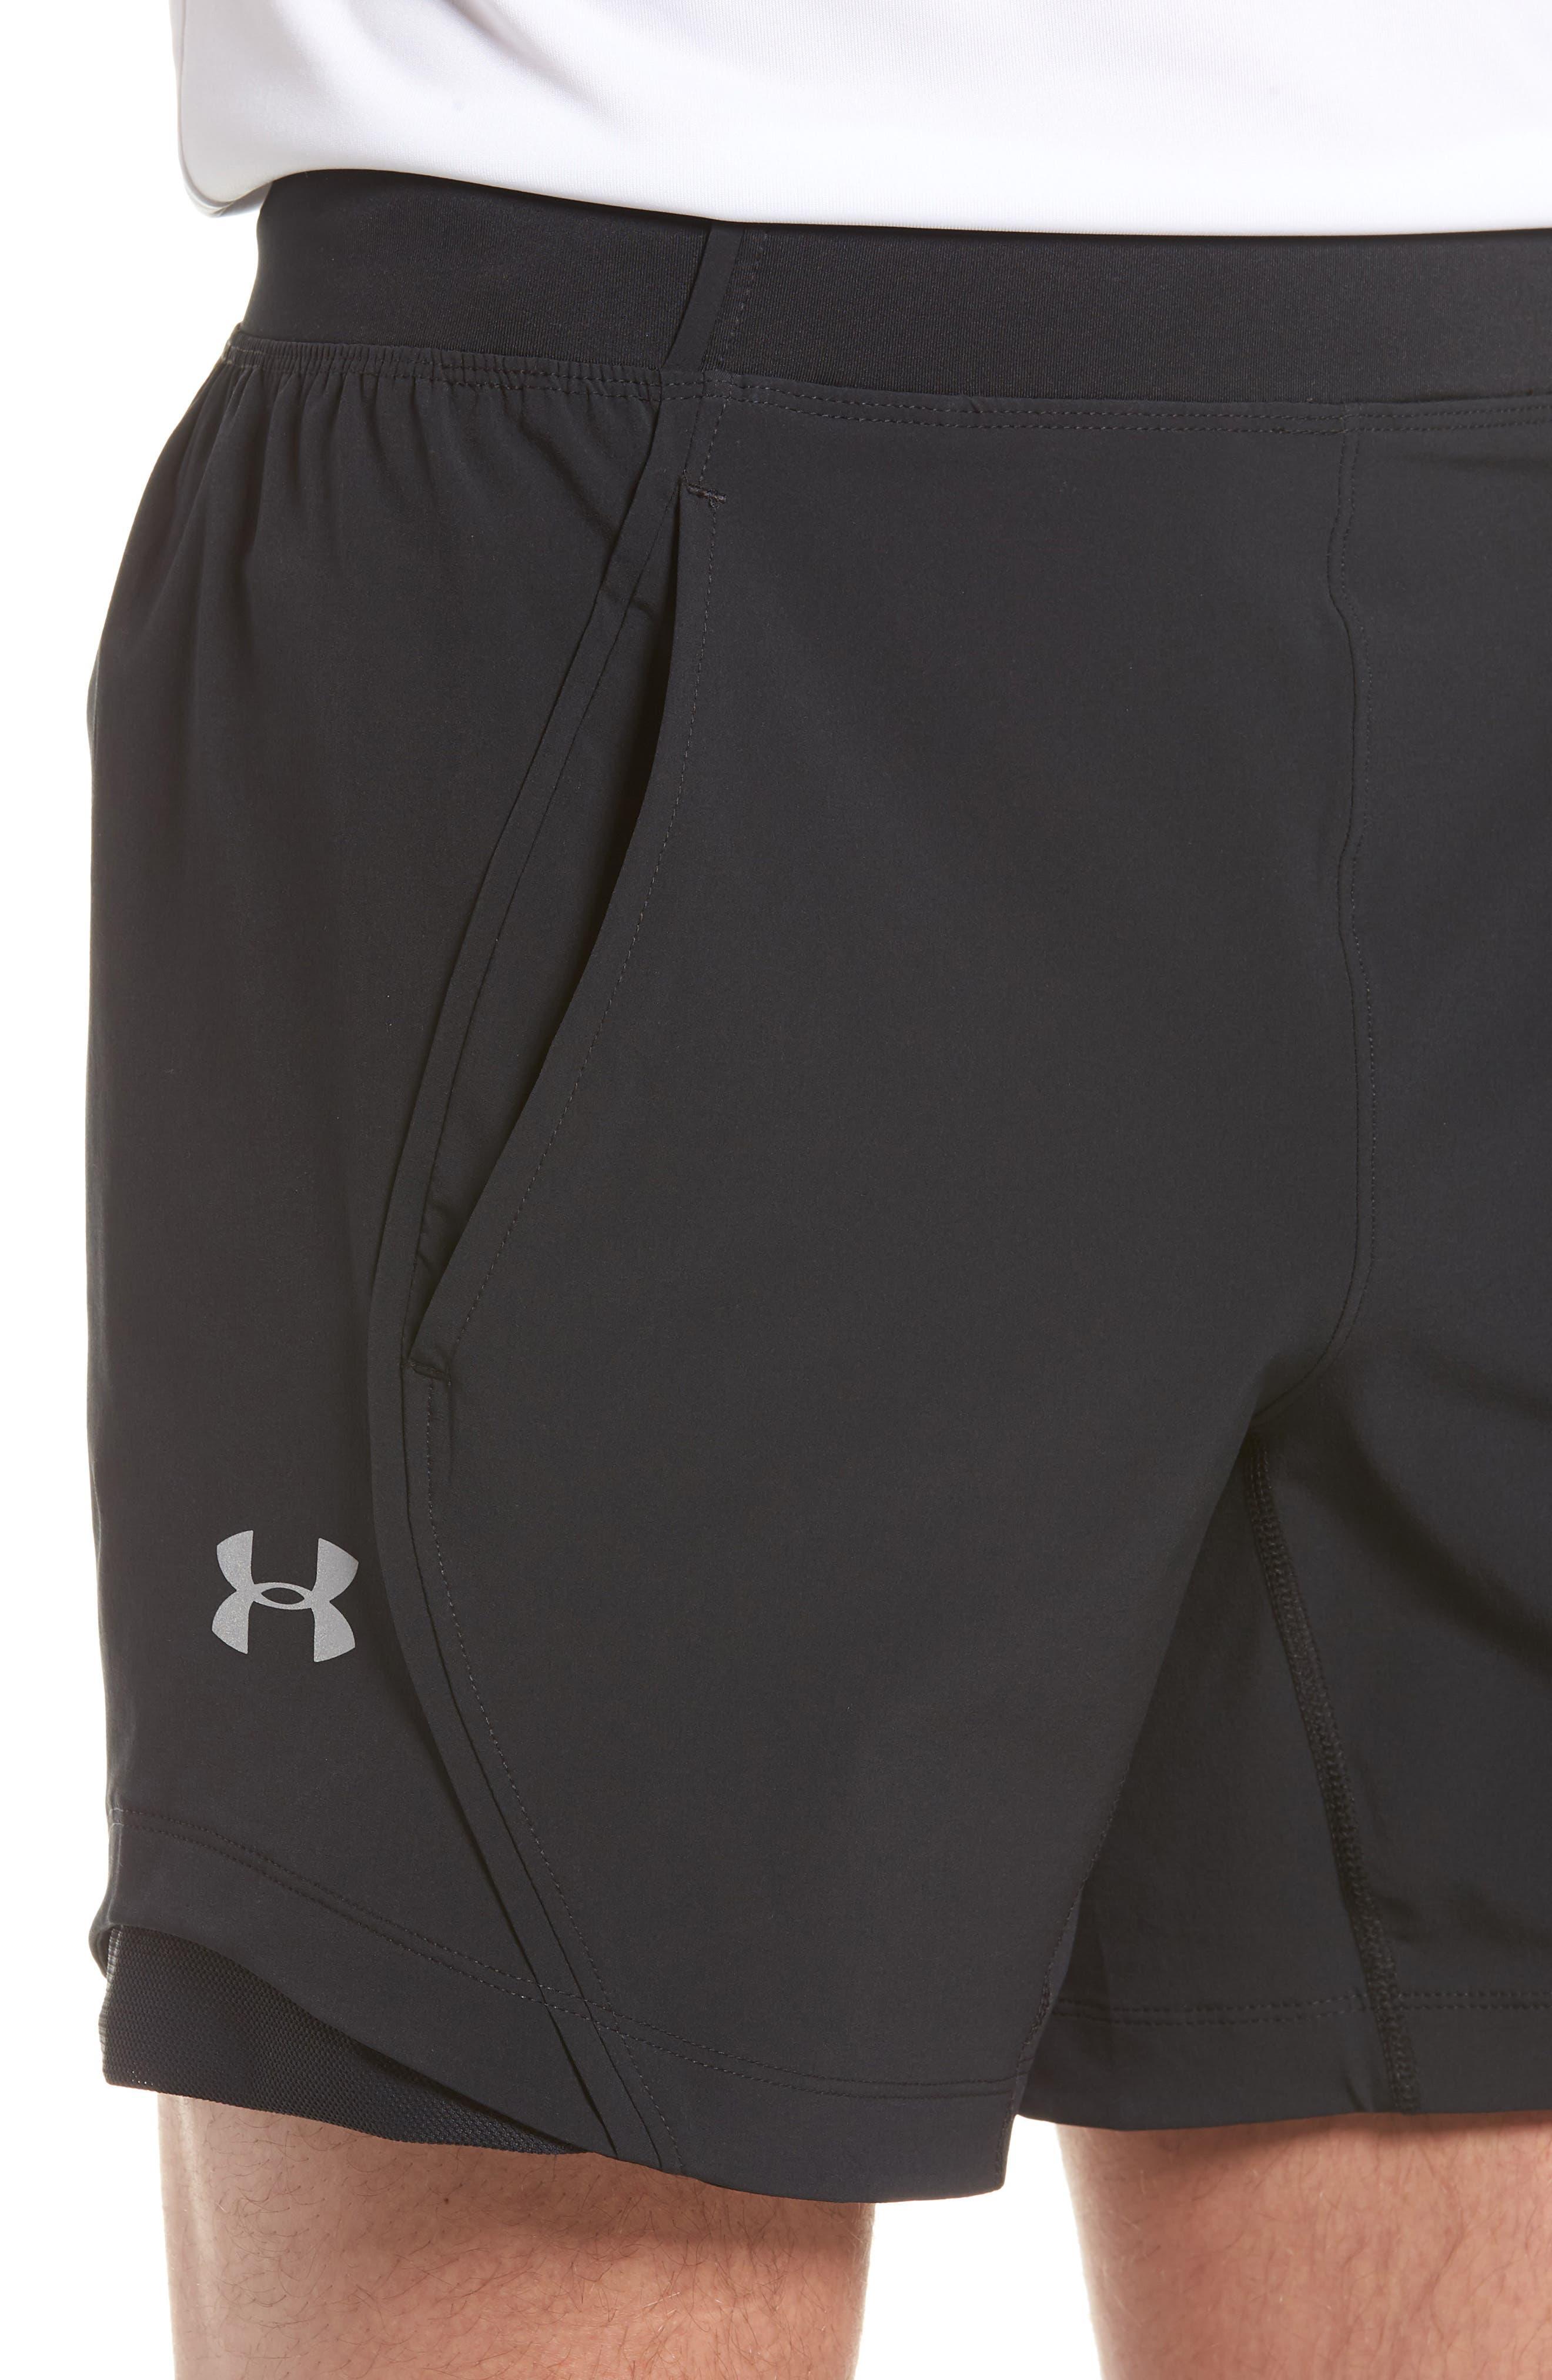 Under Armor Speedpocket Shorts,                             Alternate thumbnail 4, color,                             BLACK/ BLACK/ REFLECTIVE